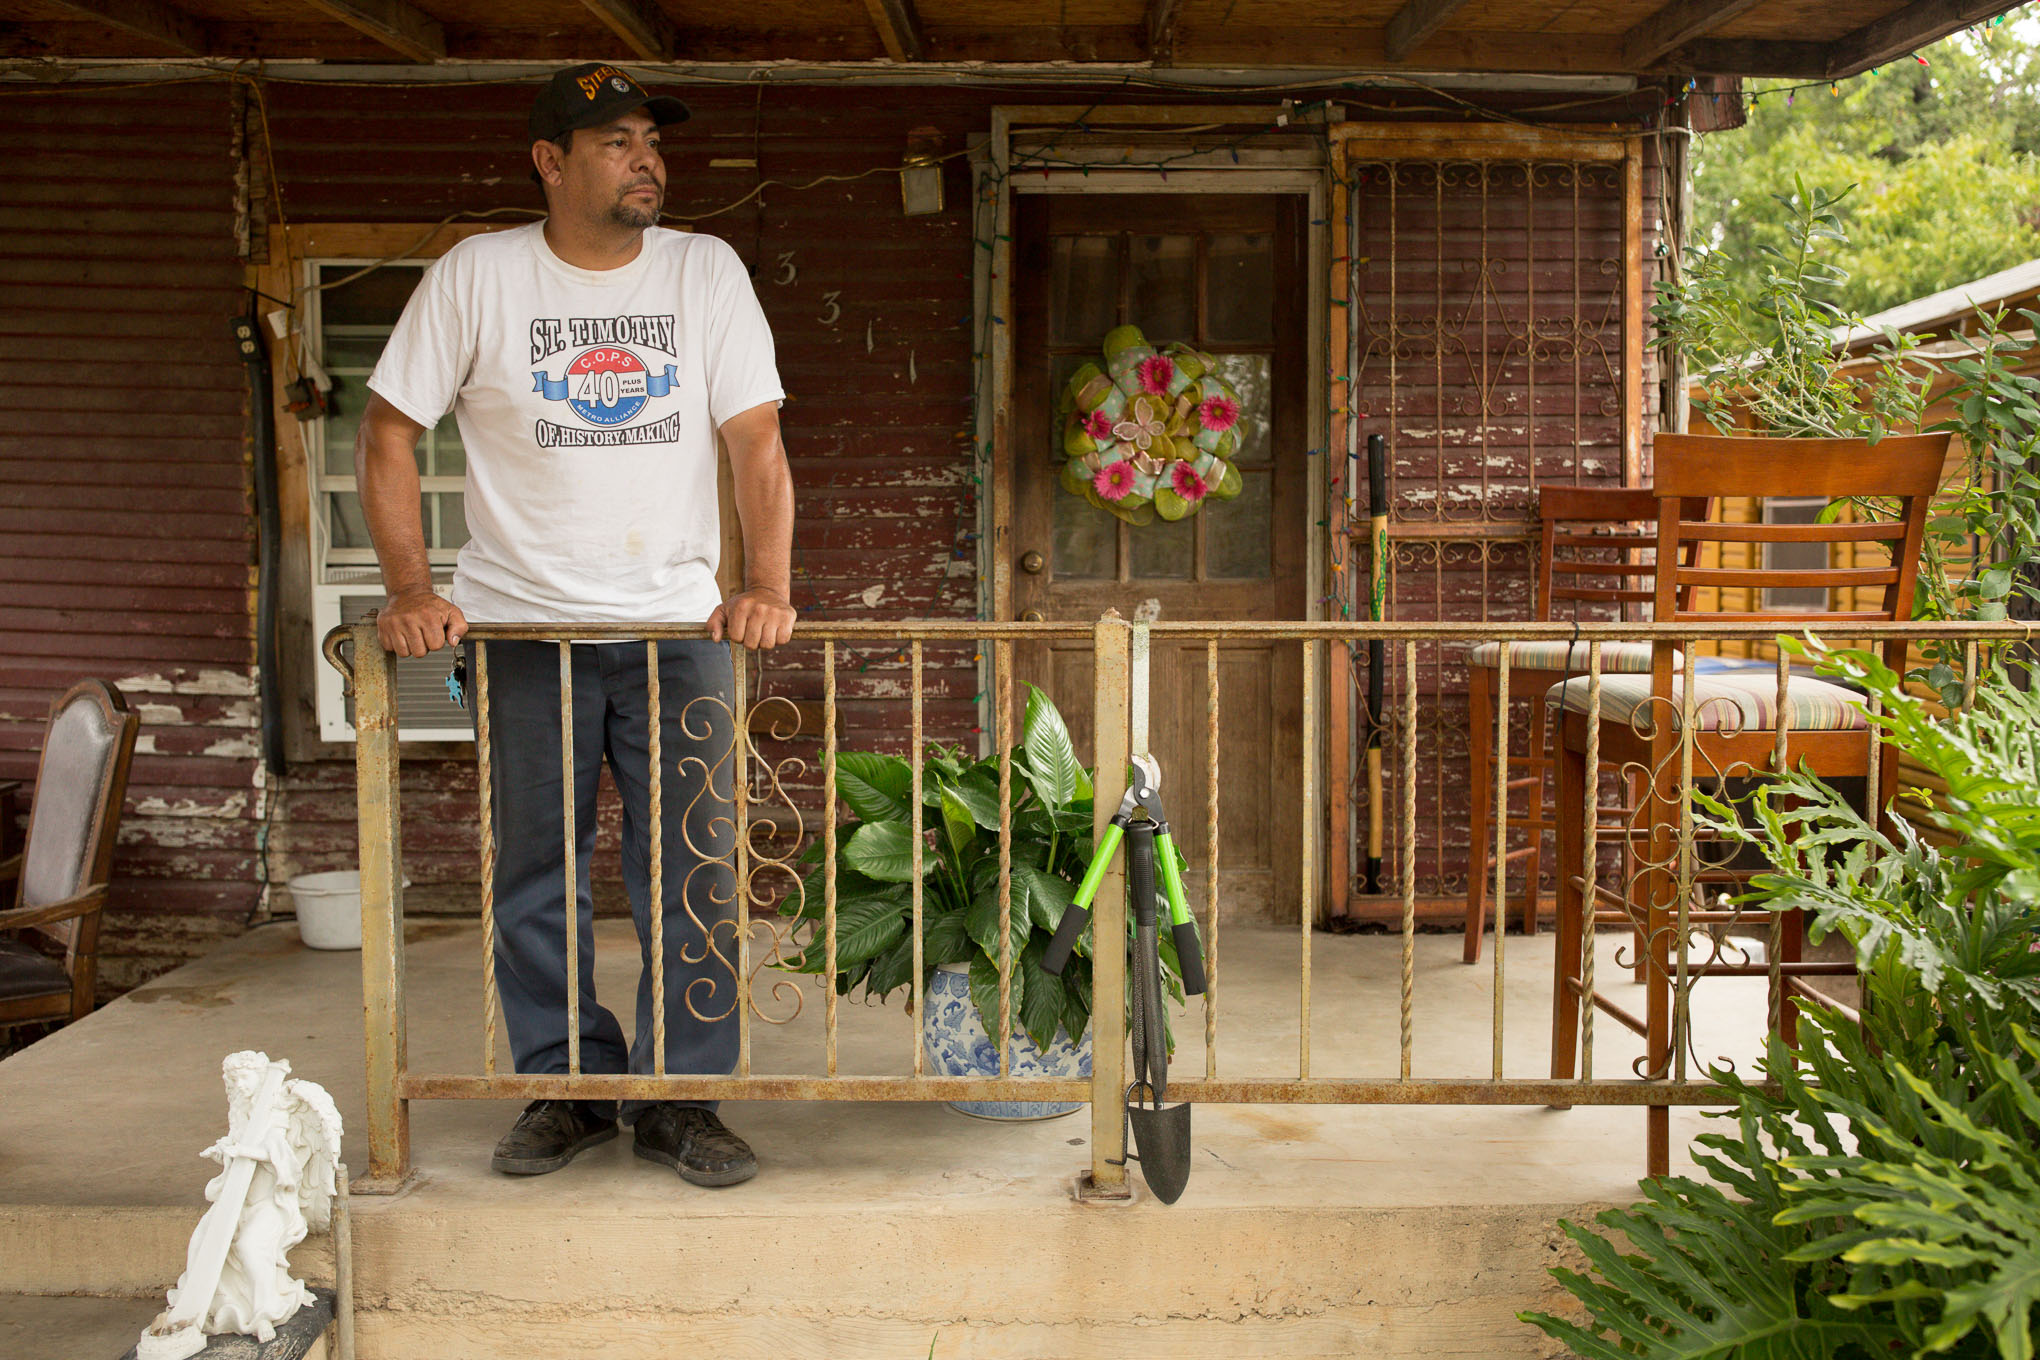 Rodrigo Rendon stands in front of his home in the Westside of San Antonio.